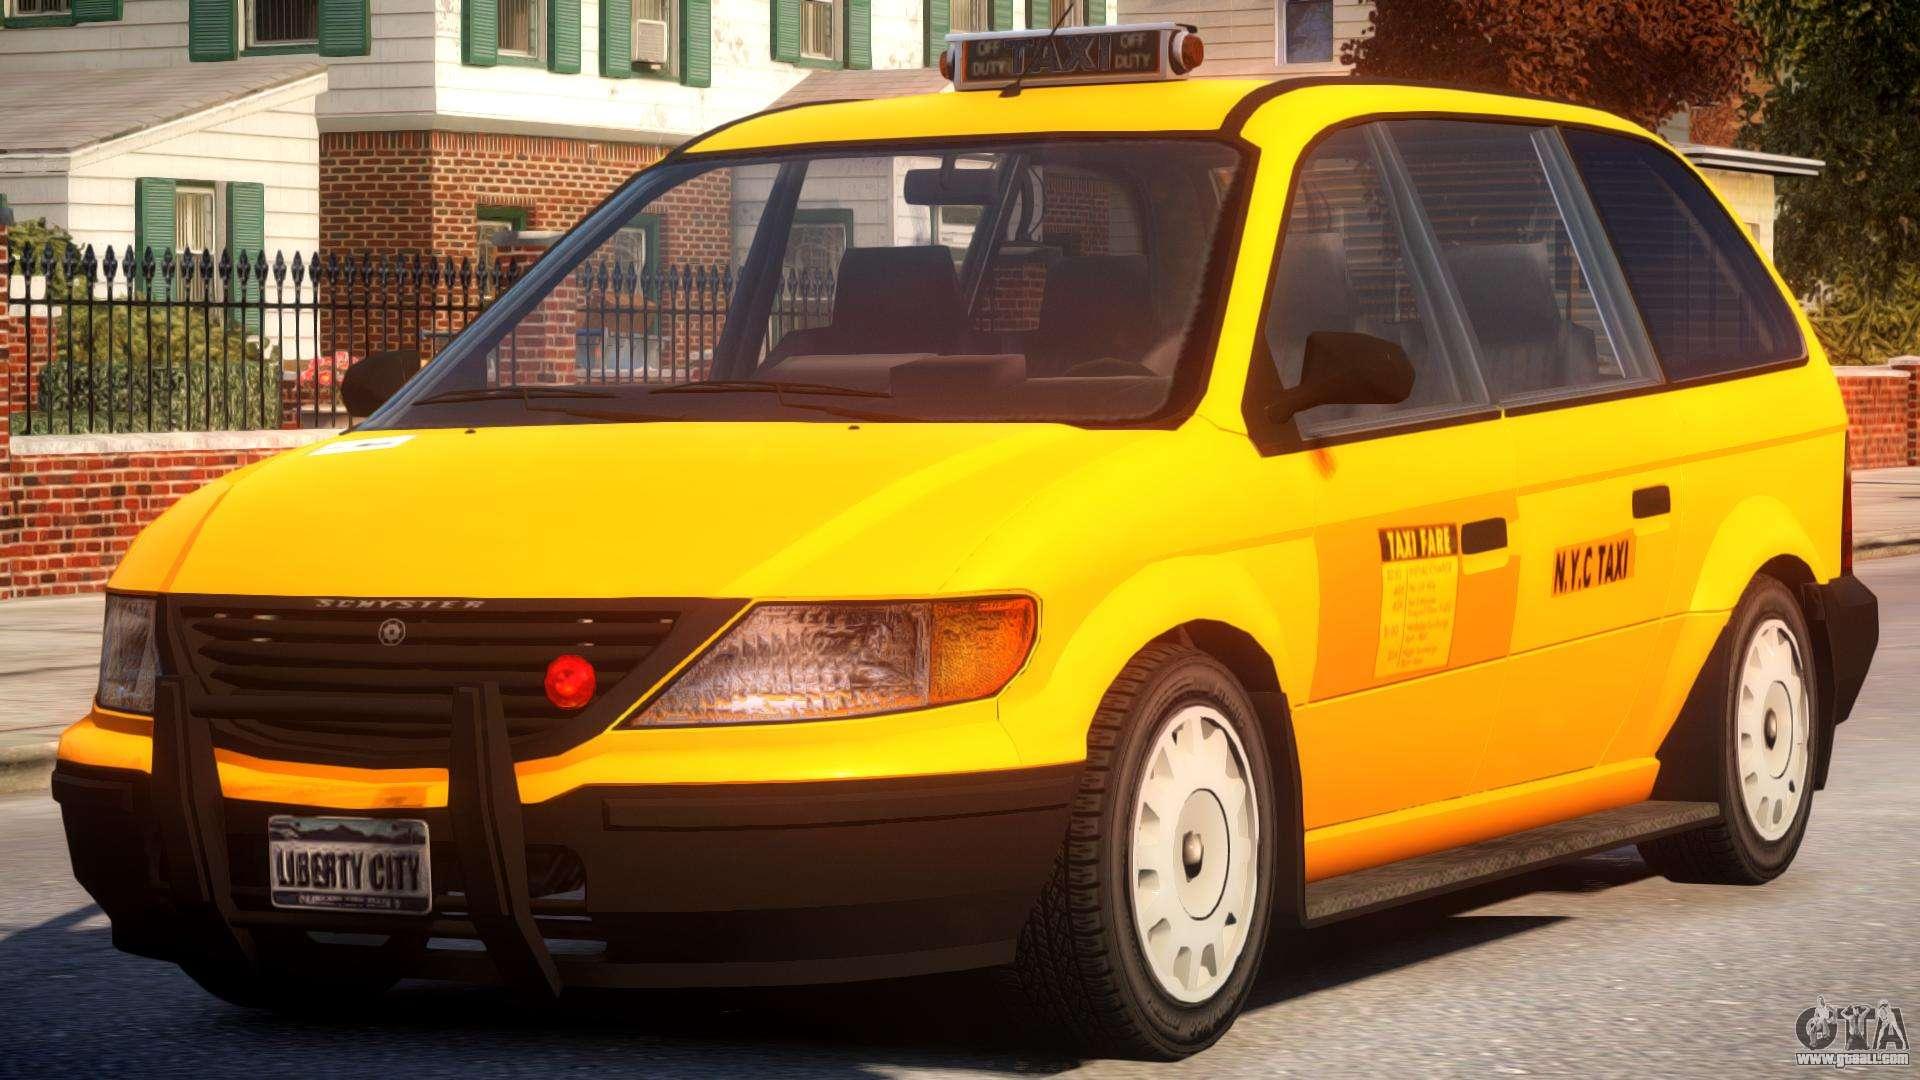 Cabbie New York City for GTA 4